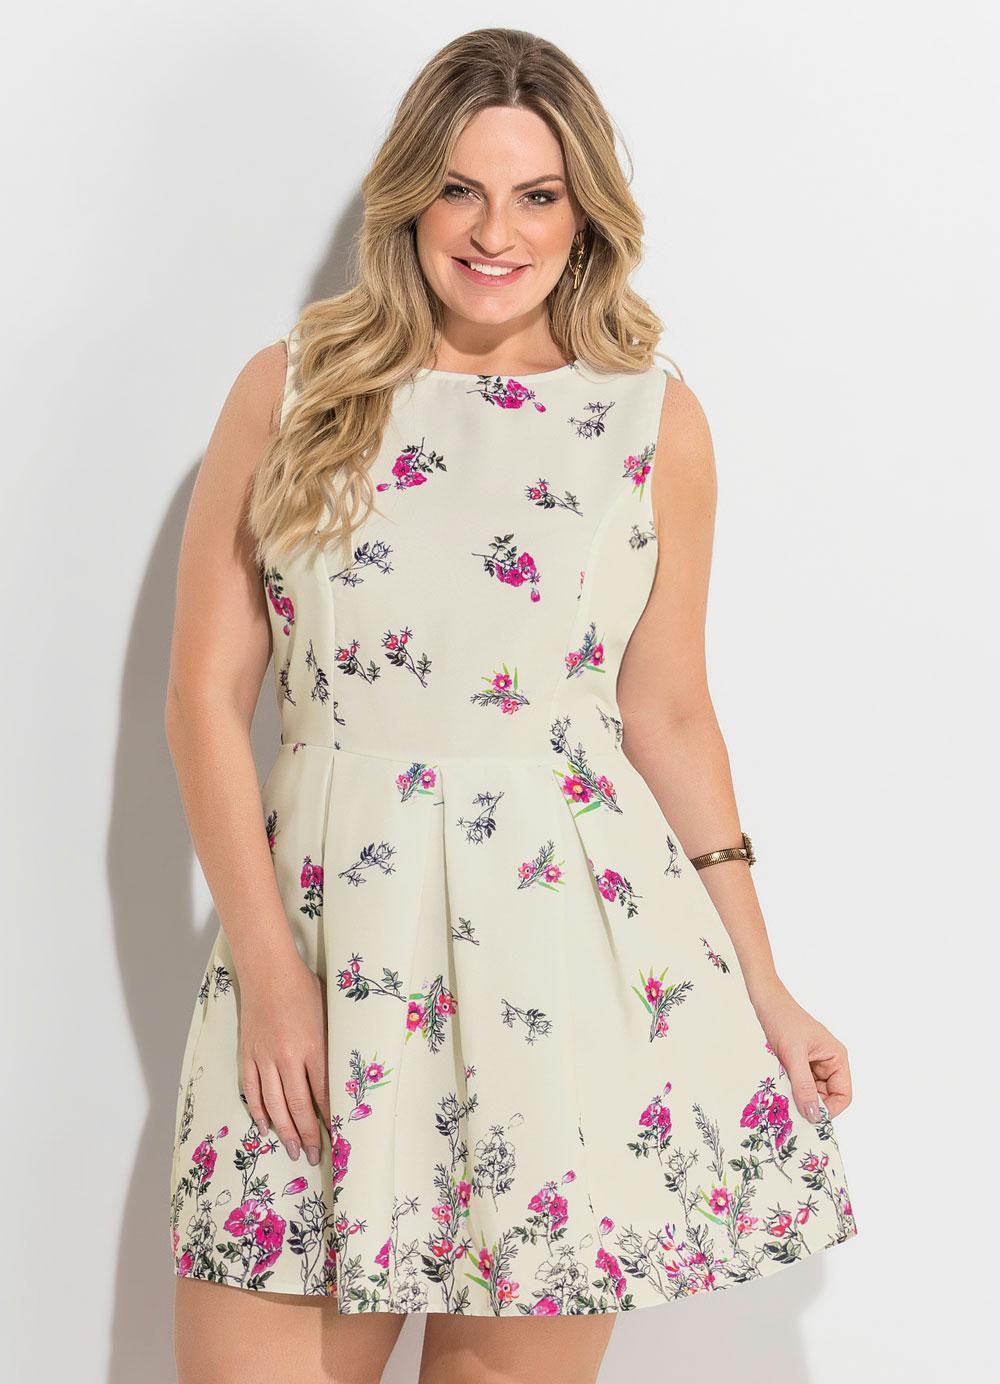 858a606c1 Vestido Acinturado Floral Plus Size Quintess - Quintess